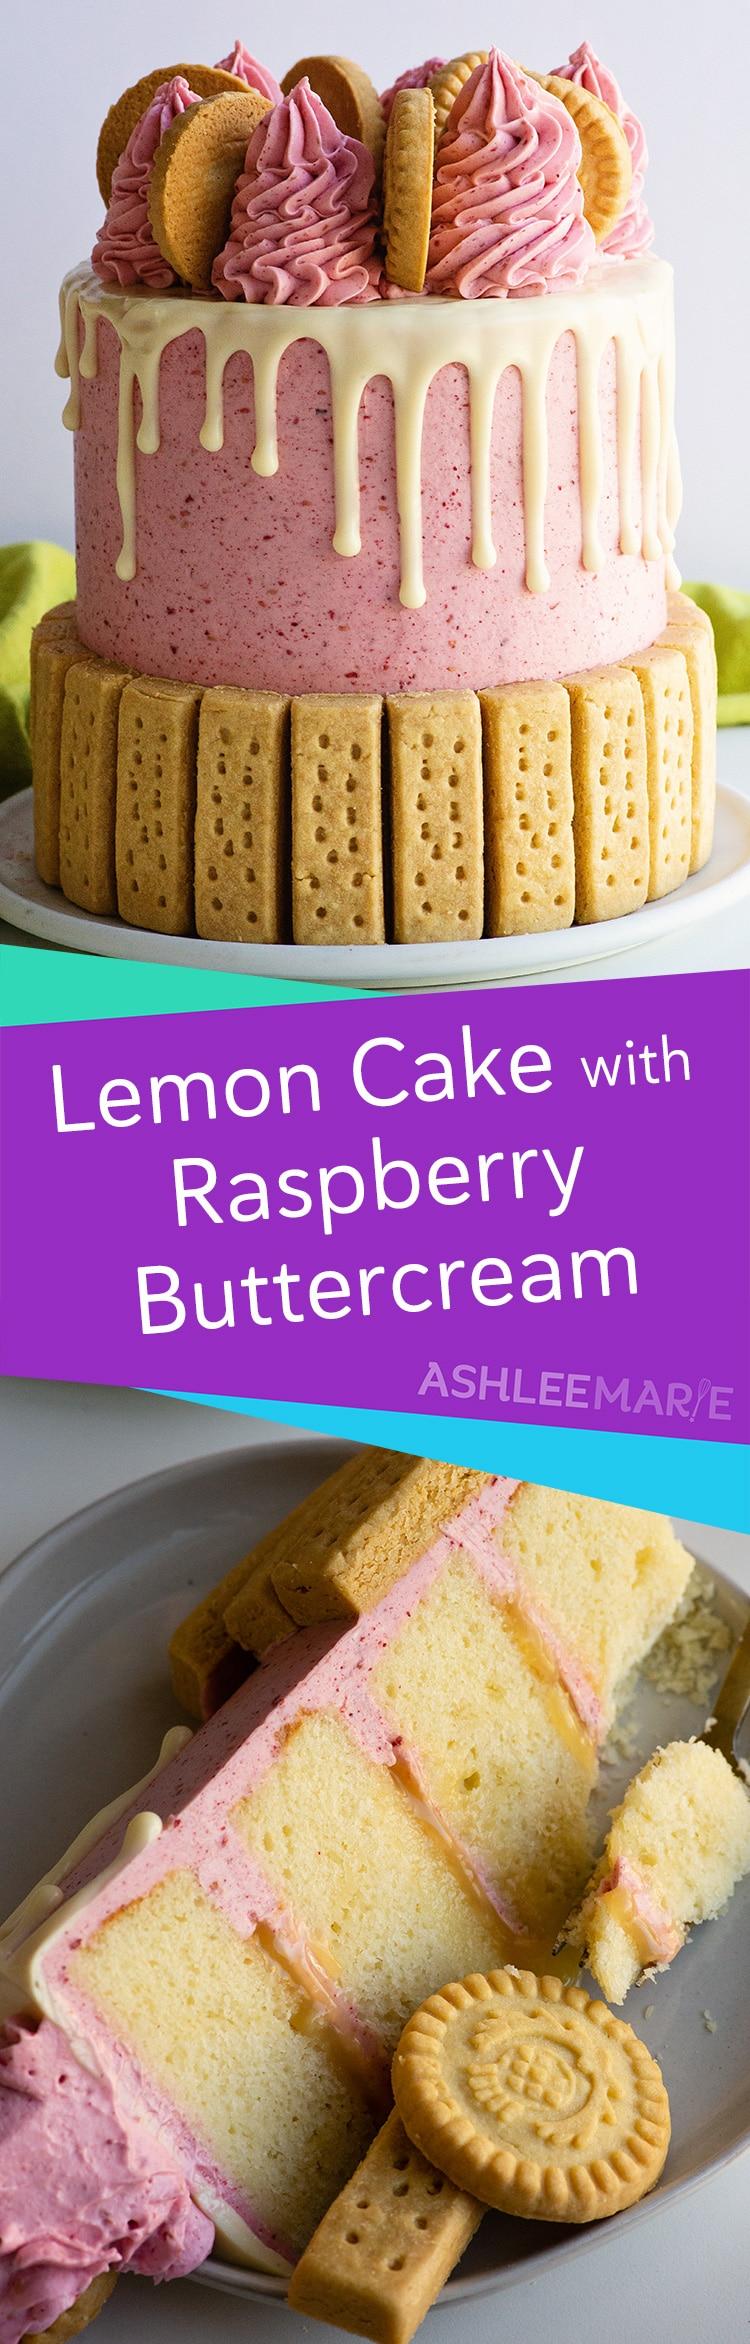 lemon cake with lemon curd and raspberry swiss meringue buttercream